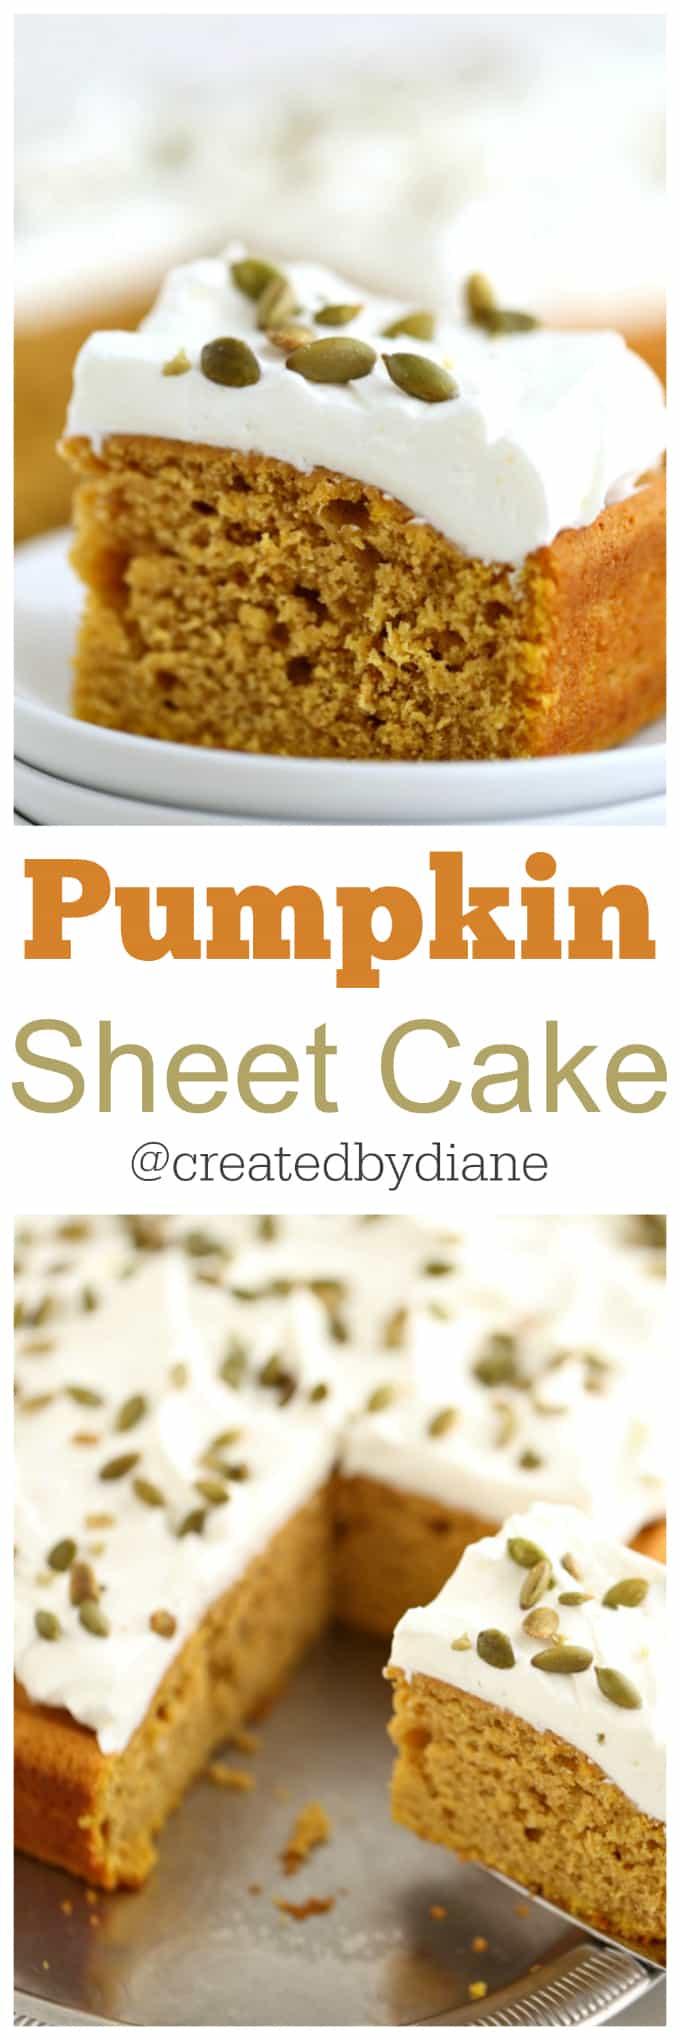 simple pumpkin sheet cake @createdbydiane